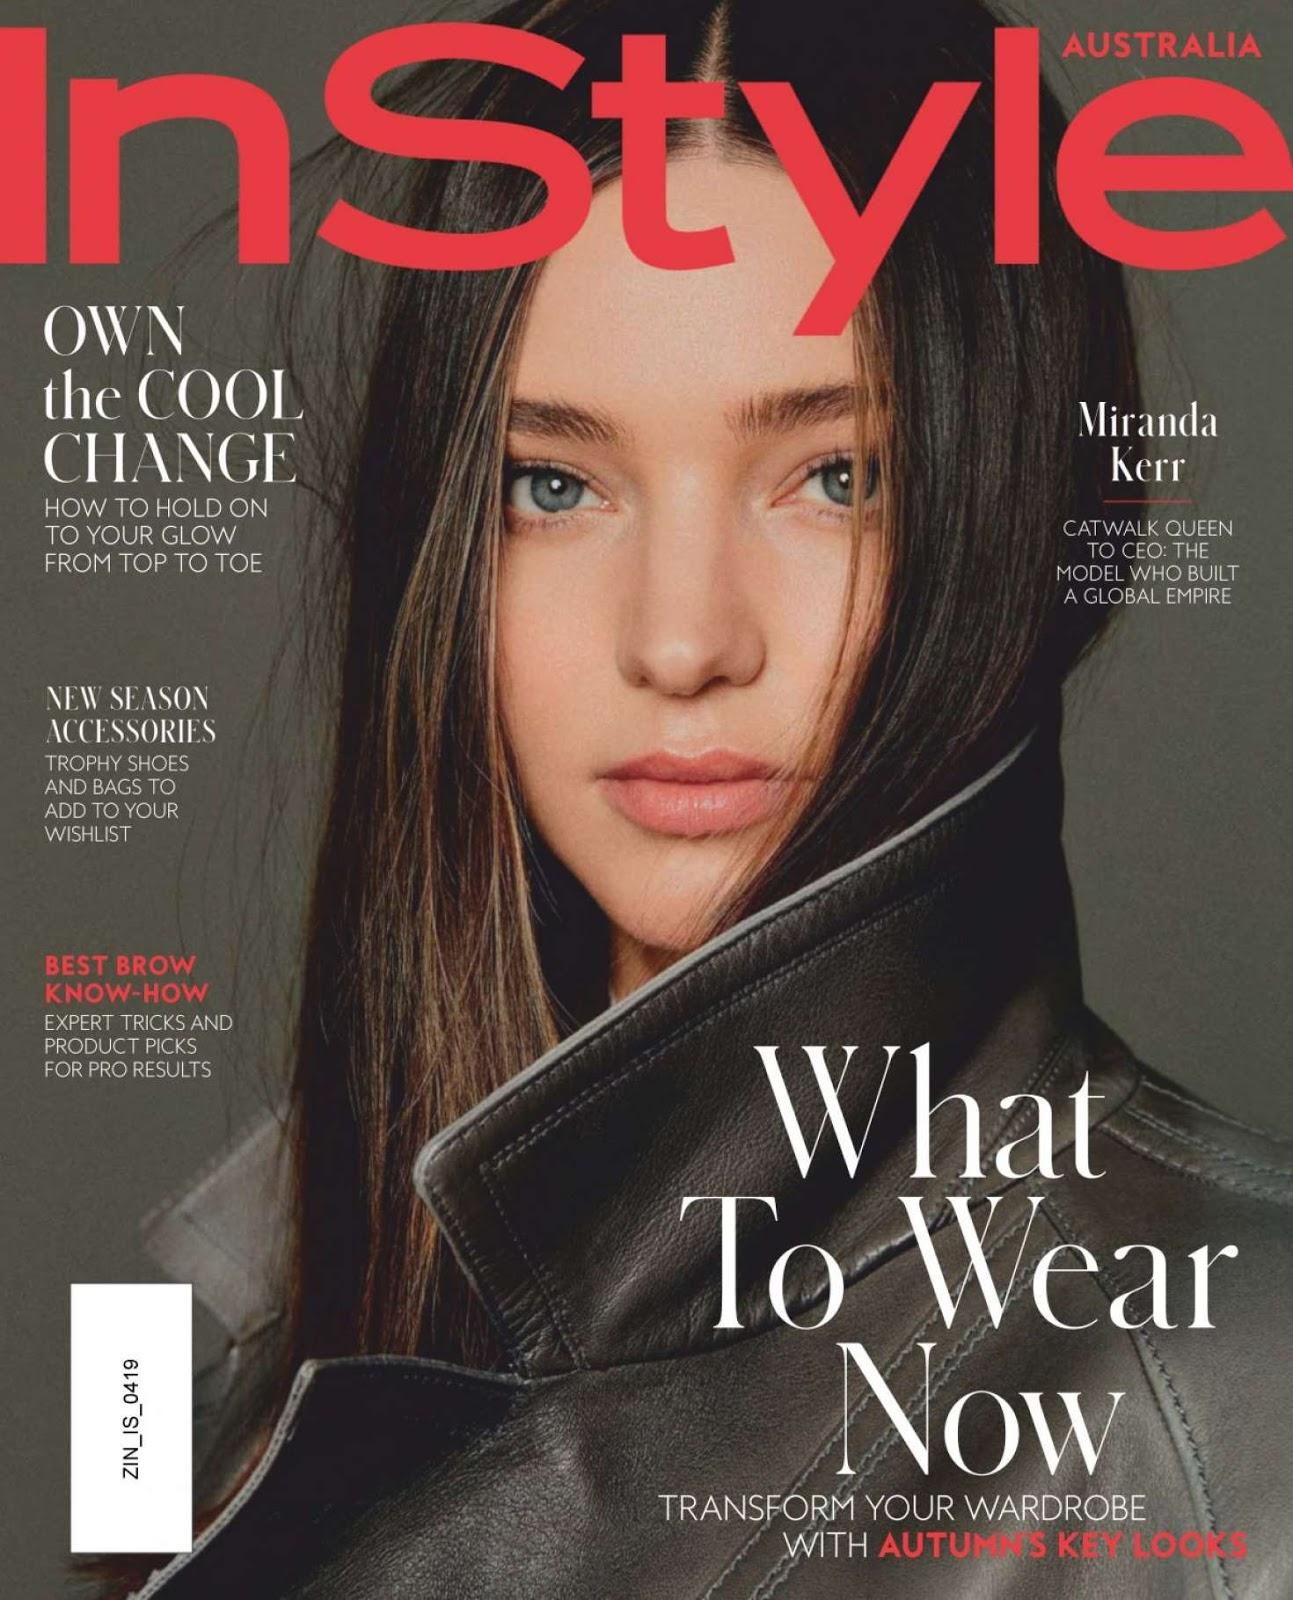 d2205fd520 Miranda Kerr Instyle Australia Magazine April 2019 | Gettyceleb ...